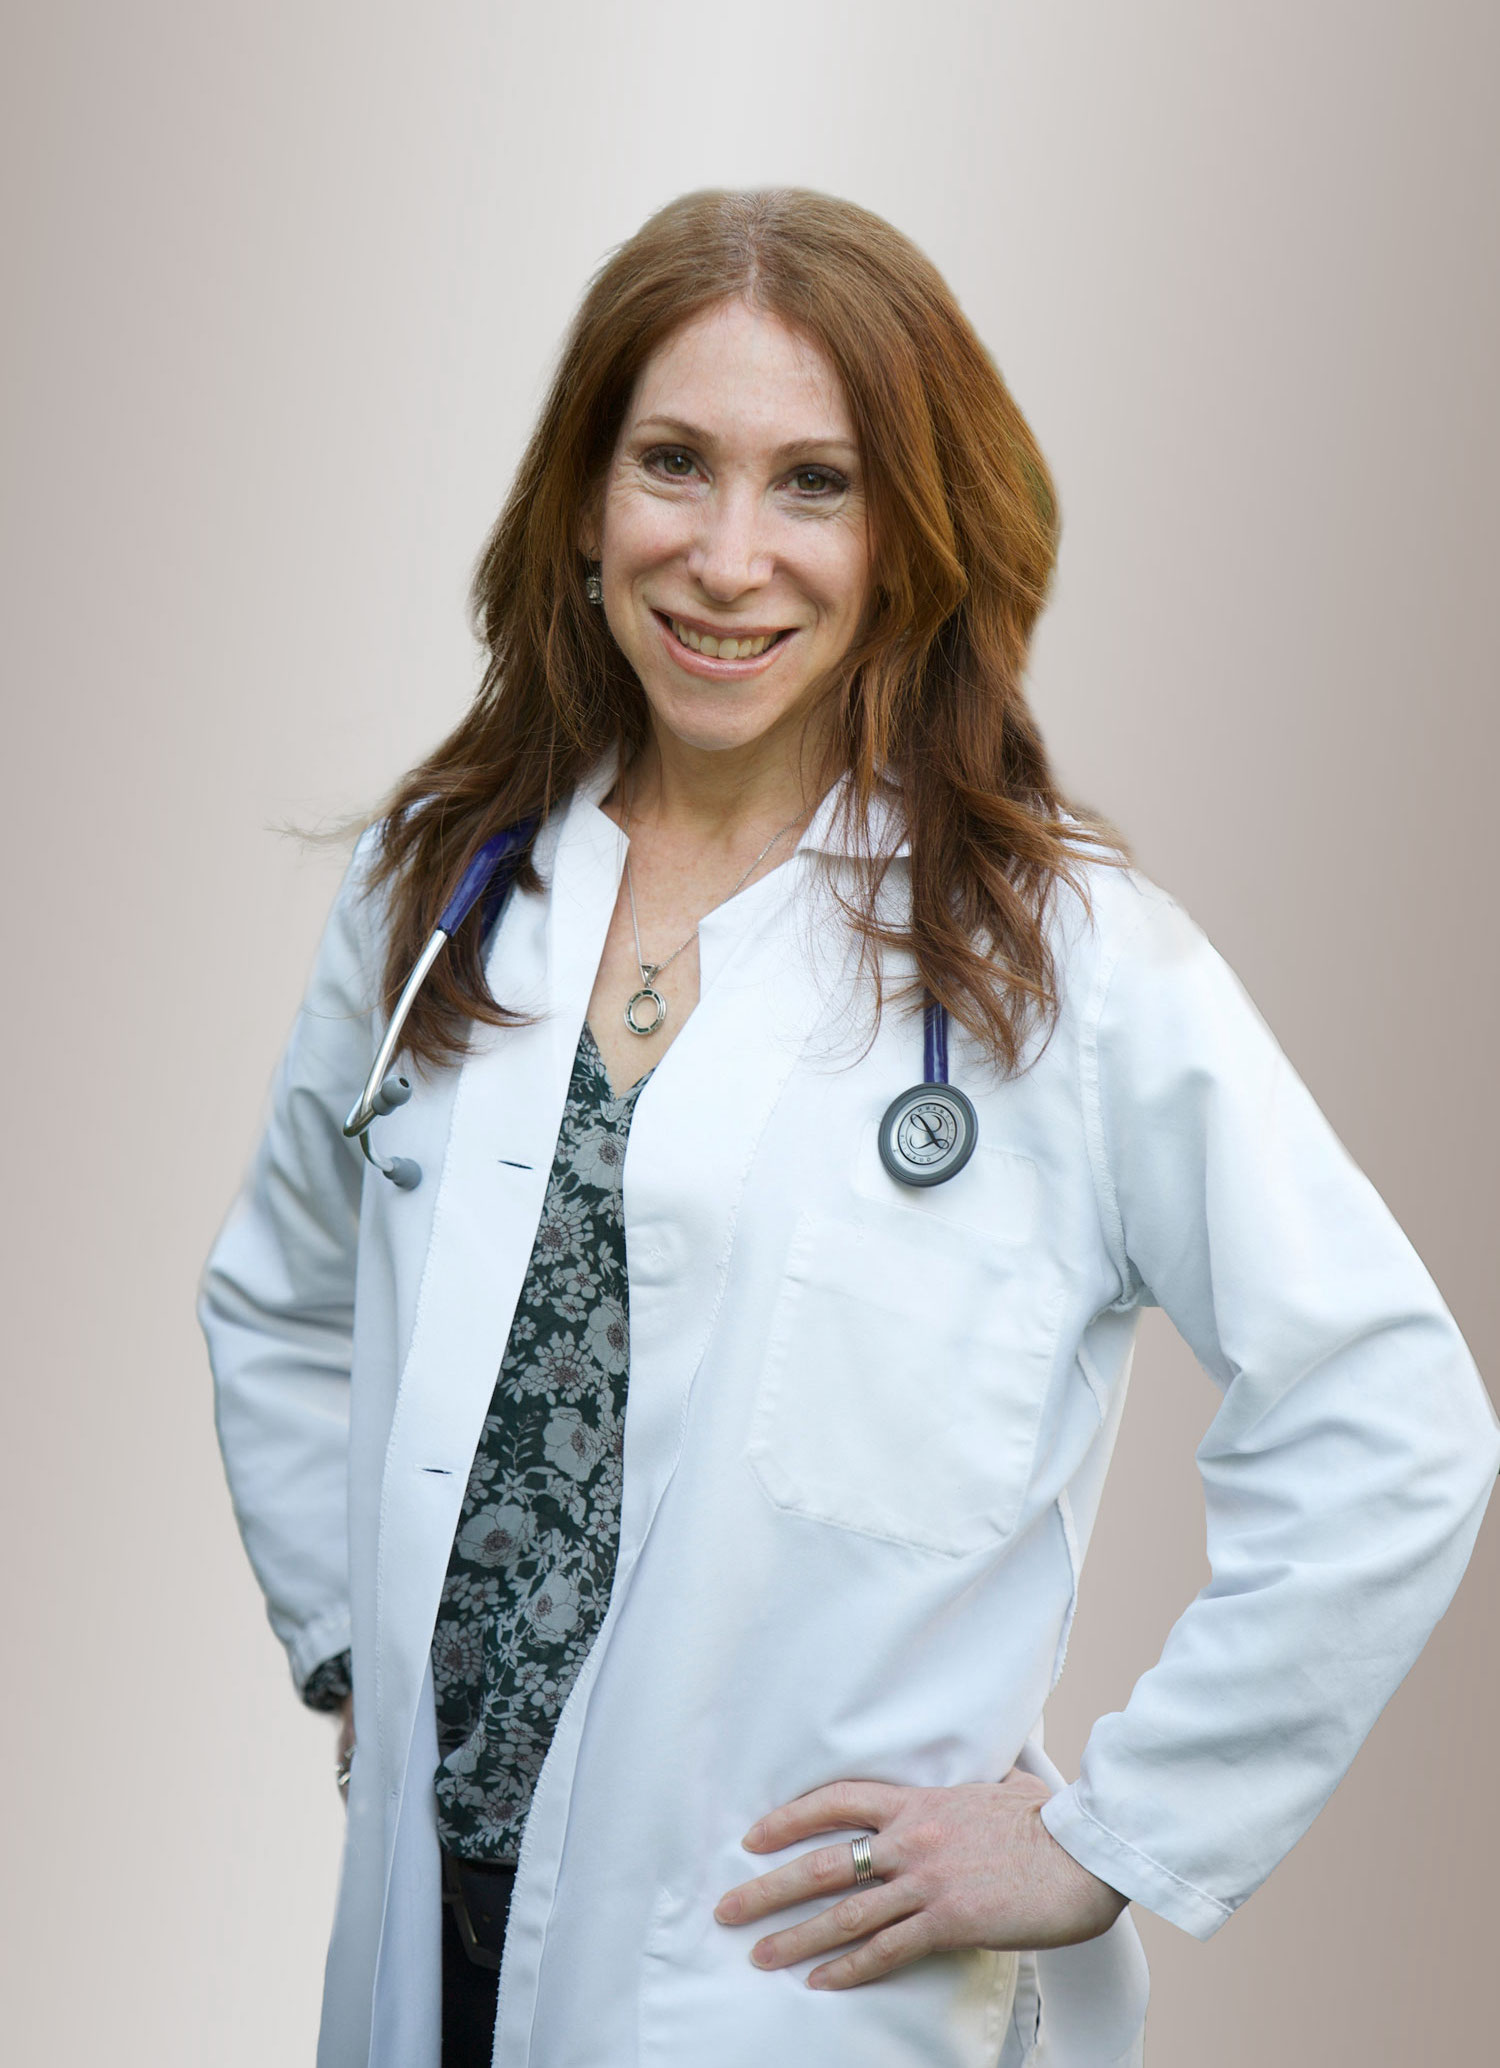 Dr. Krauss profile - Erika S. Krauss, DO